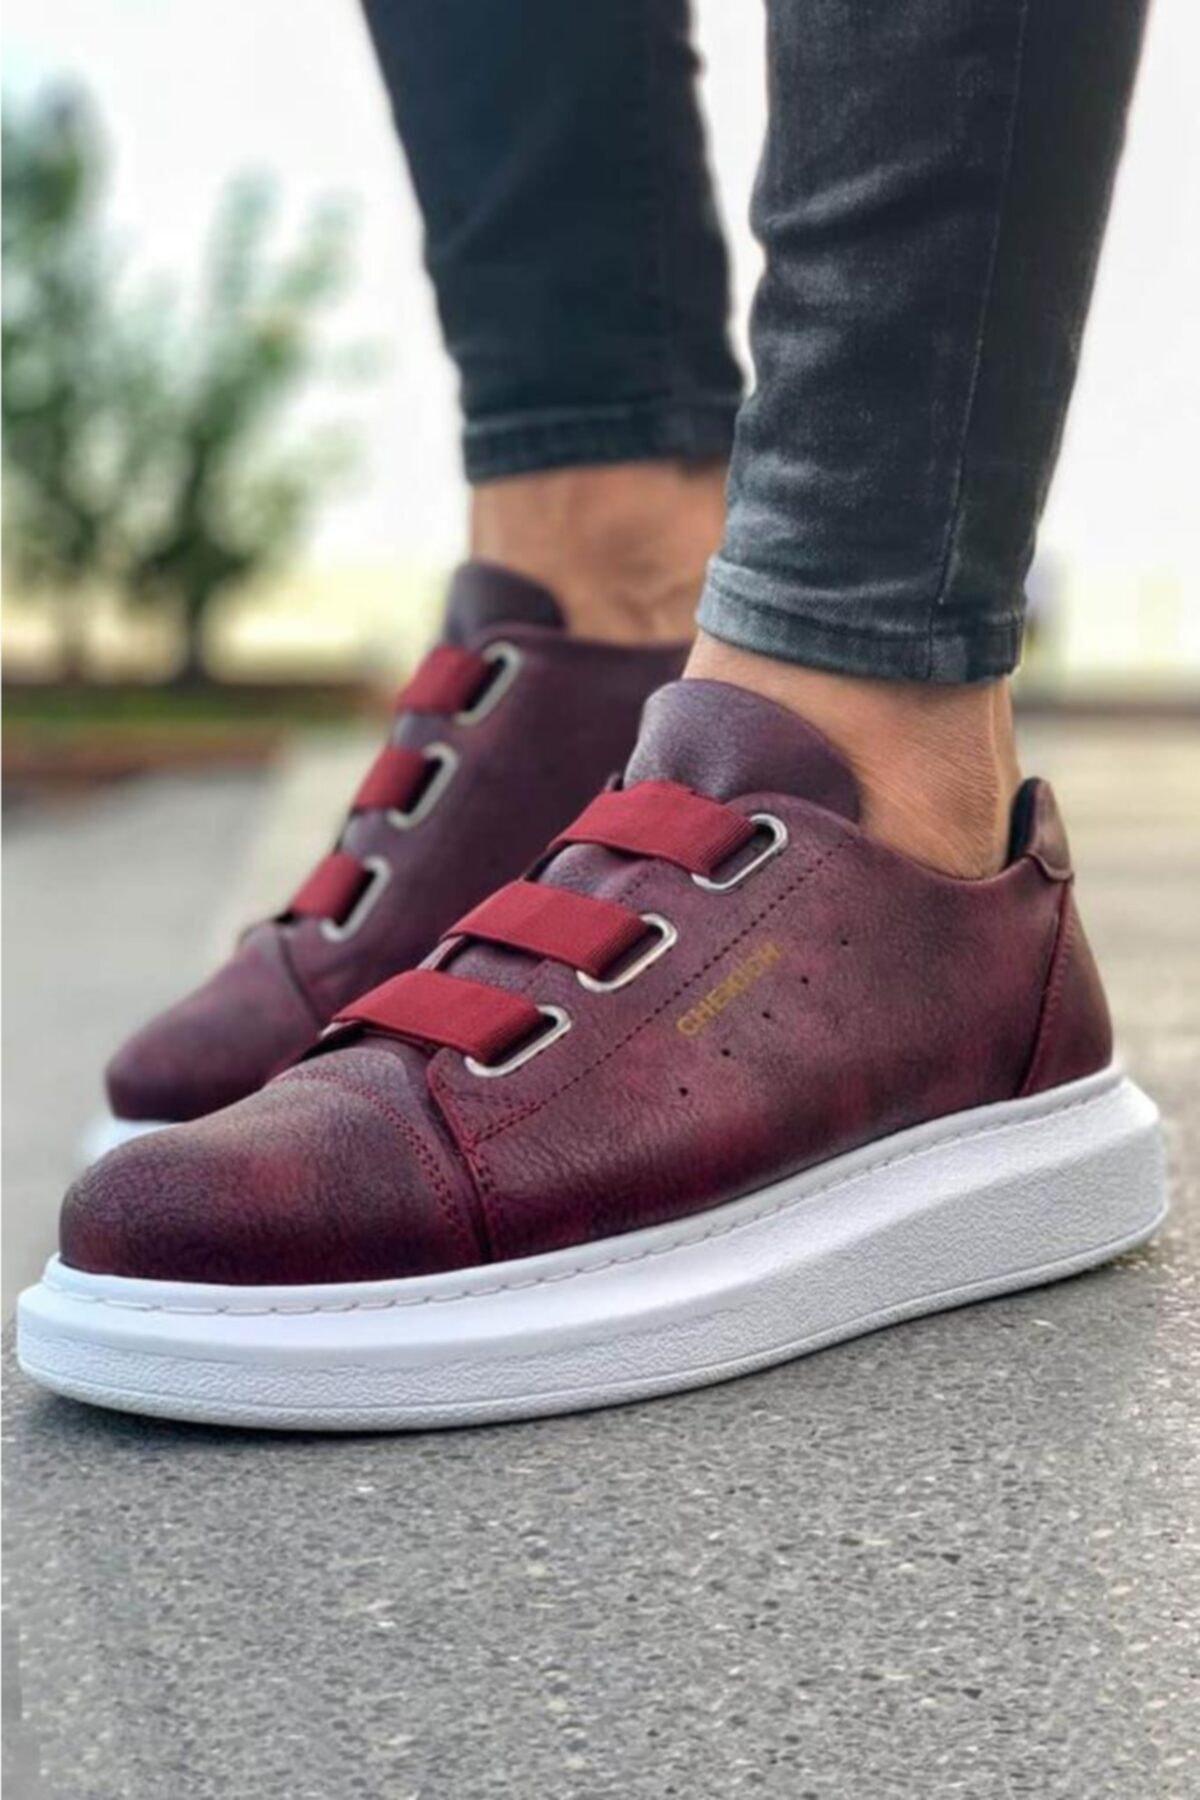 Chekich Ch Ch253 Bt Erkek Ayakkabı Bordo 1